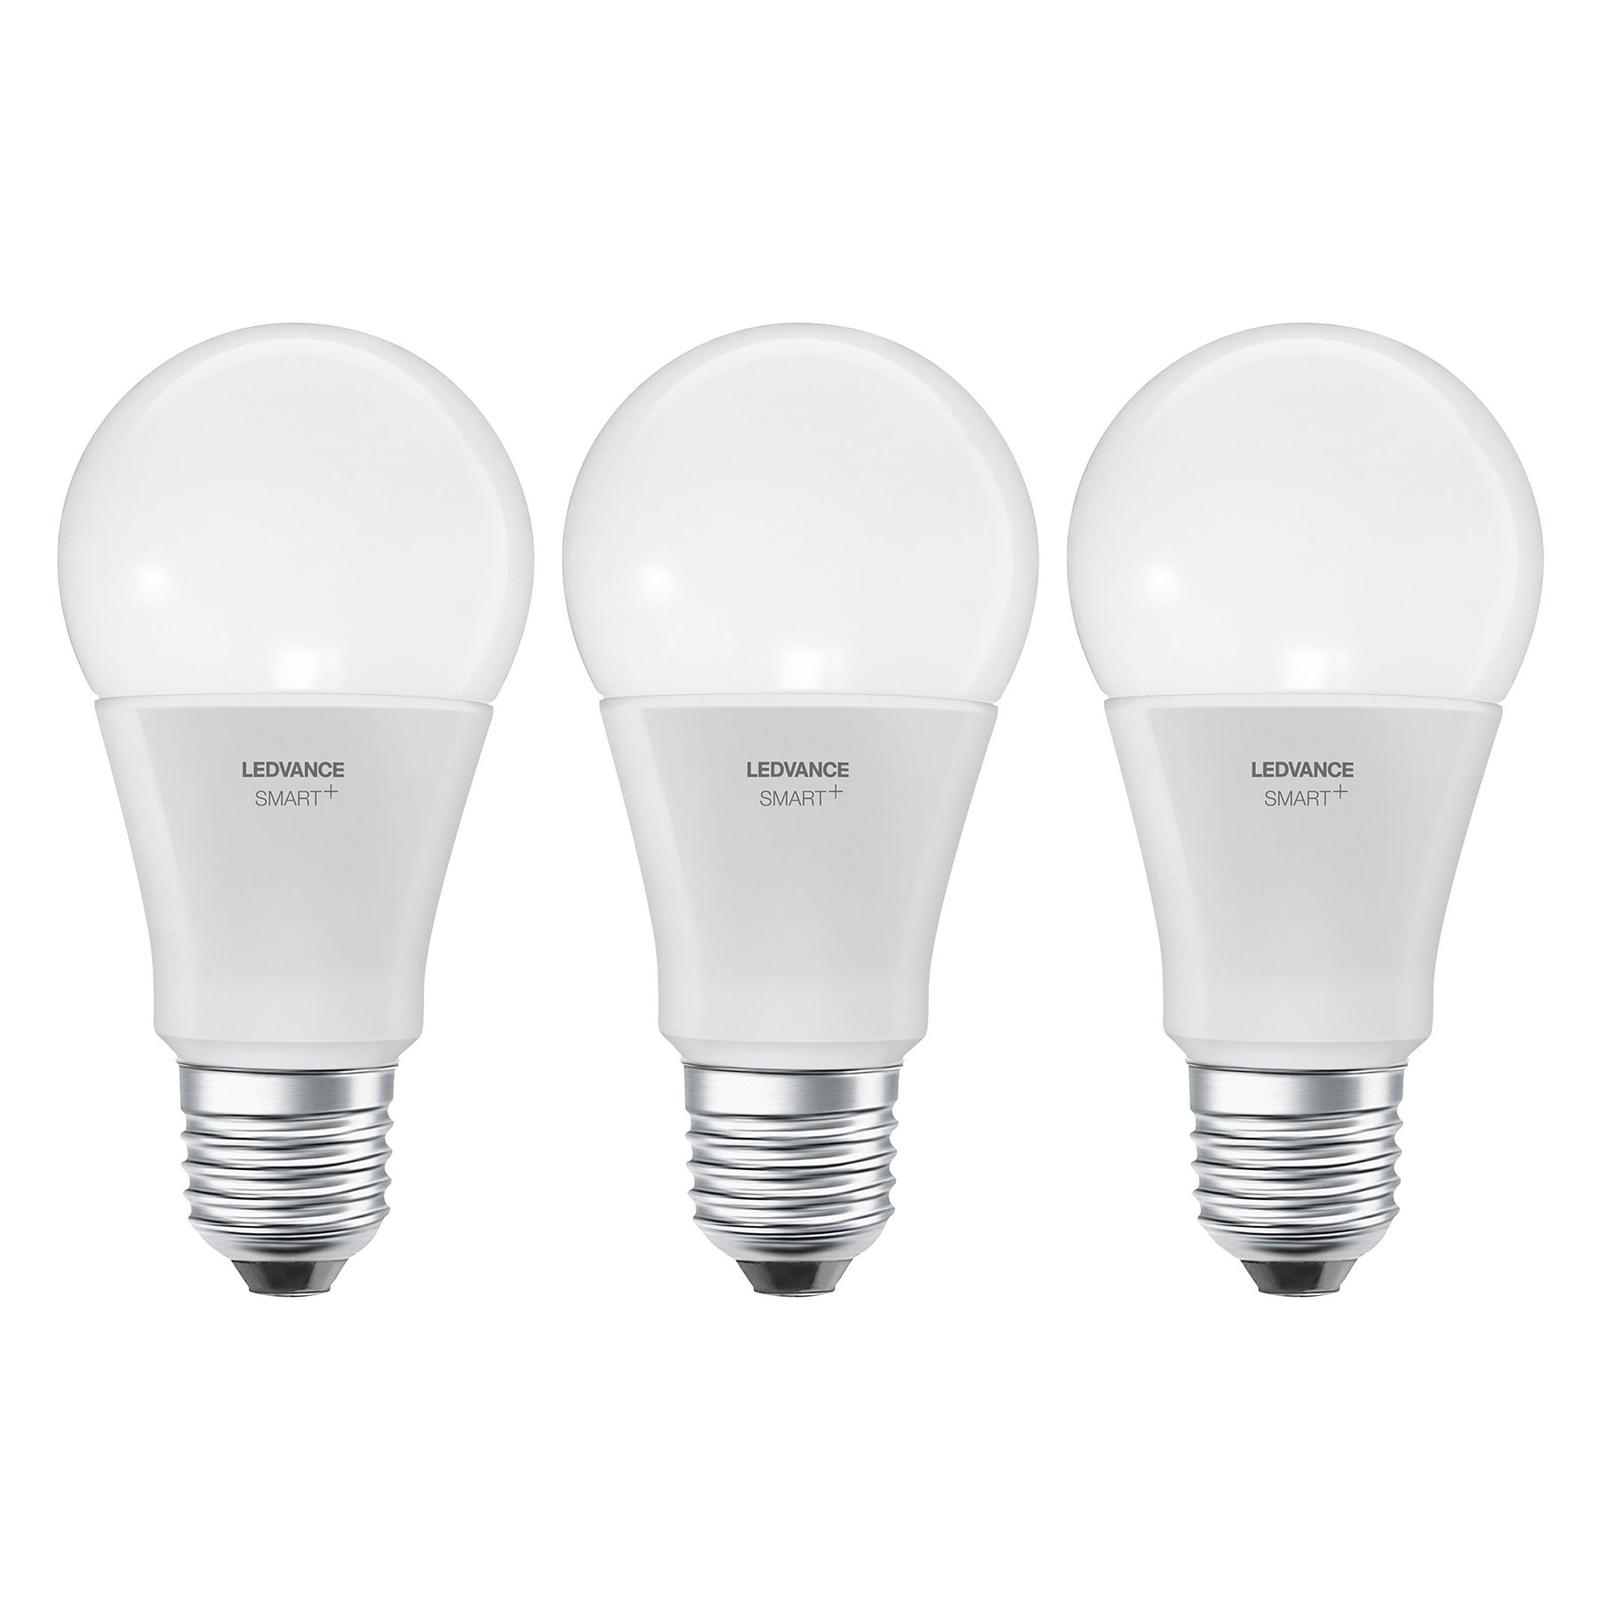 LEDVANCE SMART+ WiFi E27 9W Classic CCT 3er